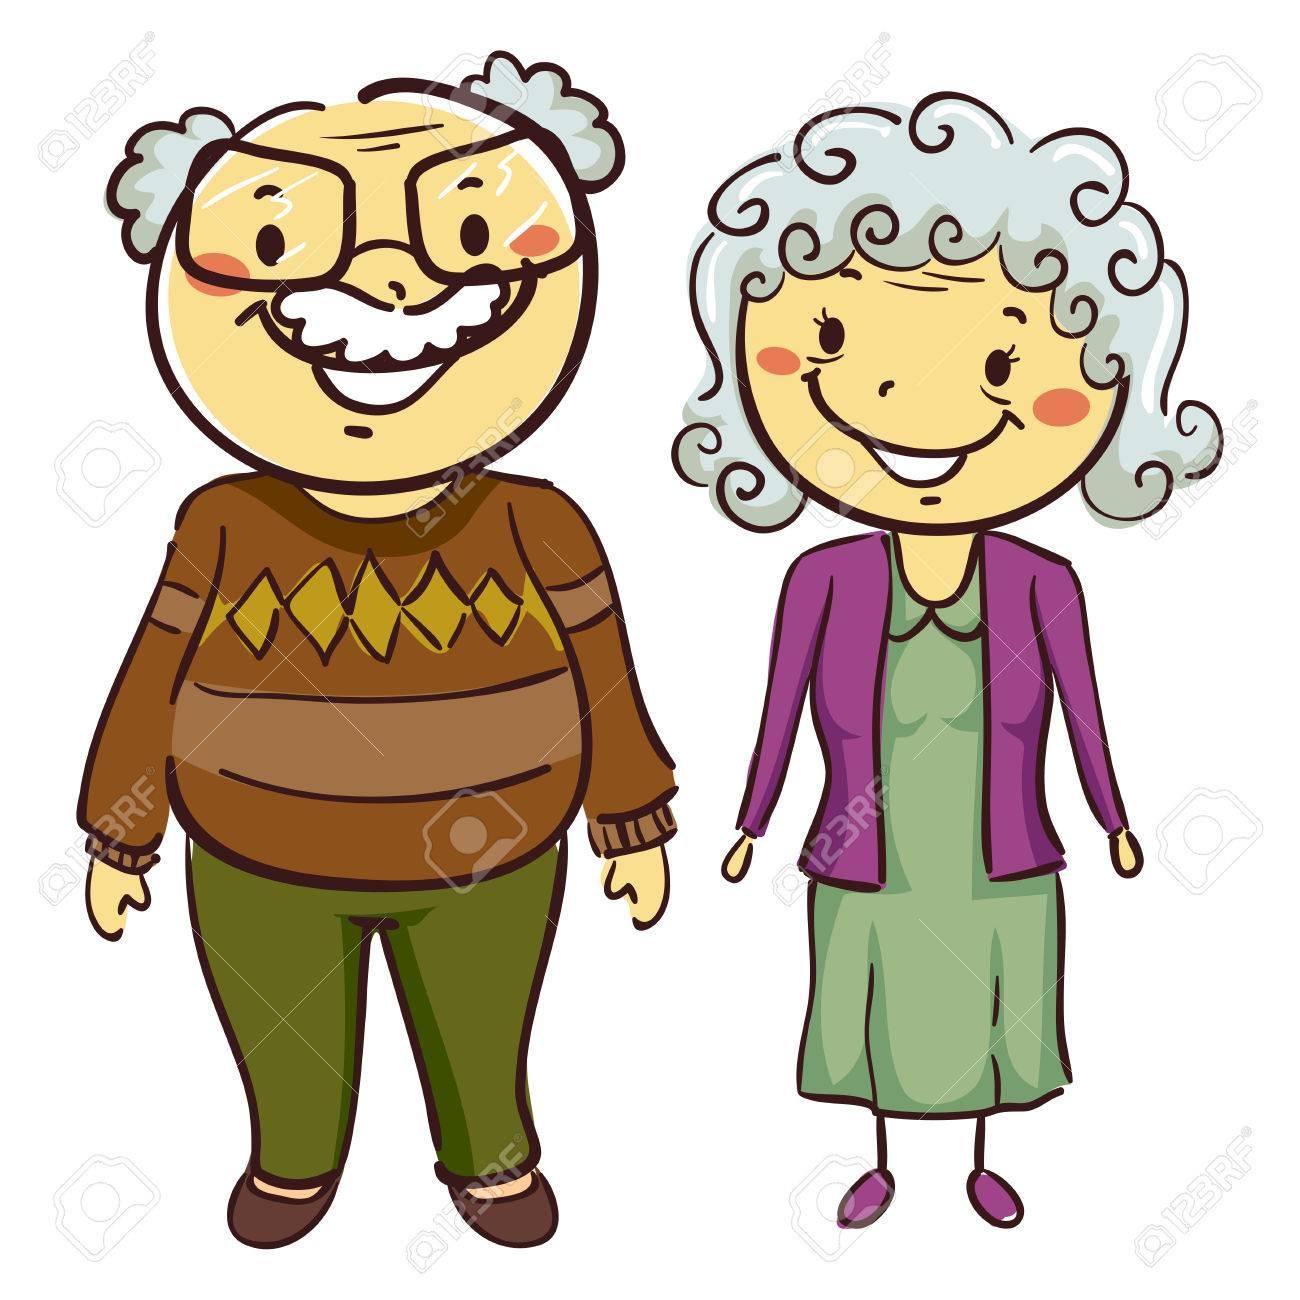 Grandma and grandpa clipart 4 » Clipart Station.